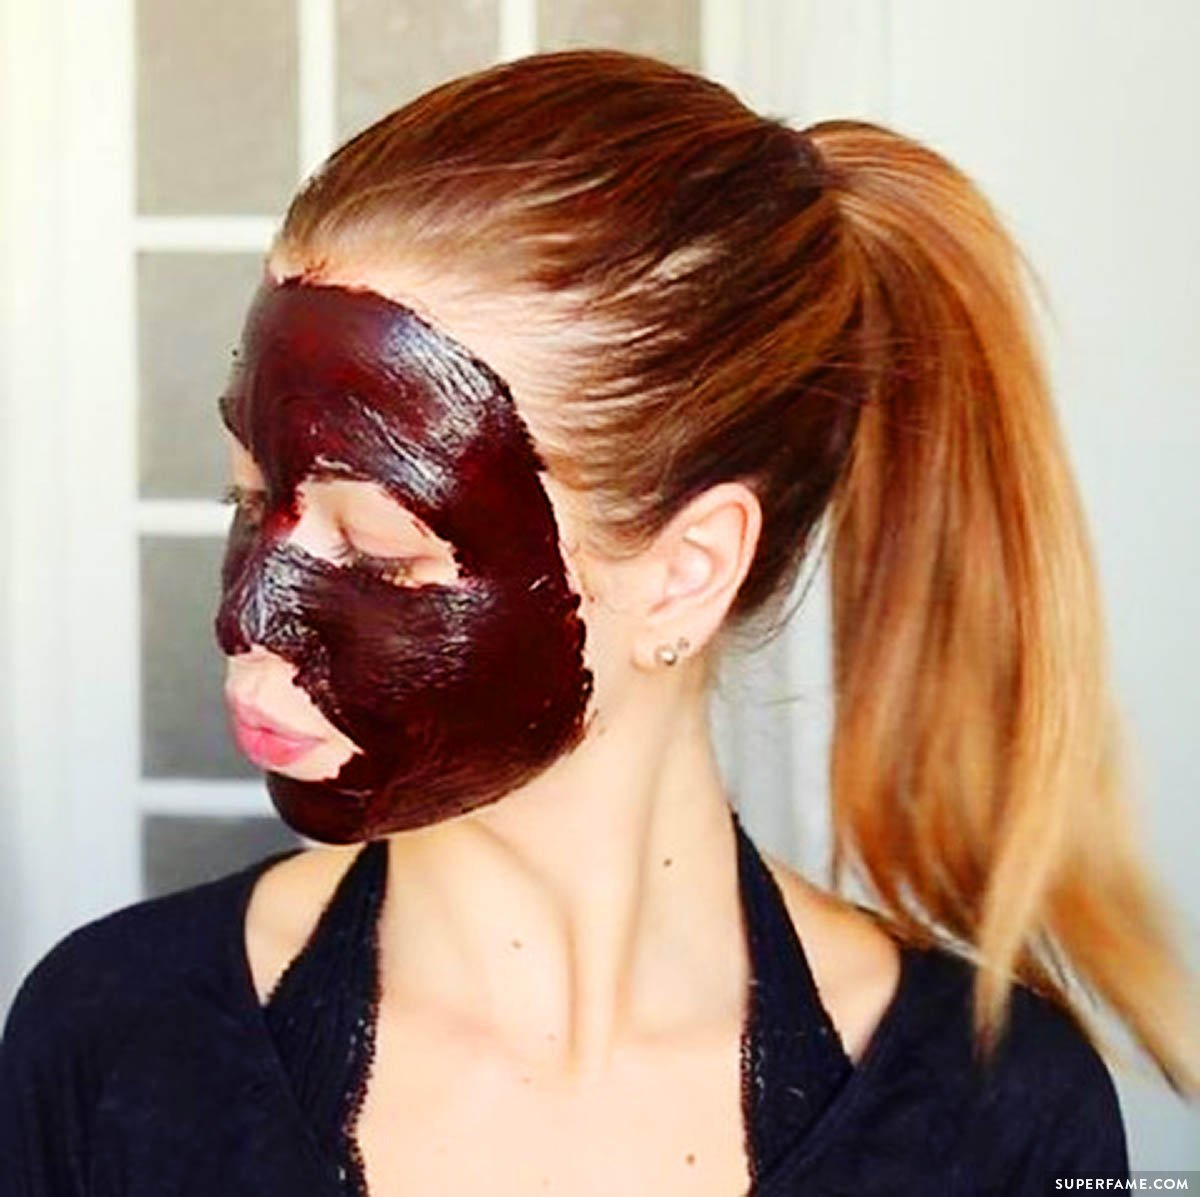 Chocolate Face Mask!